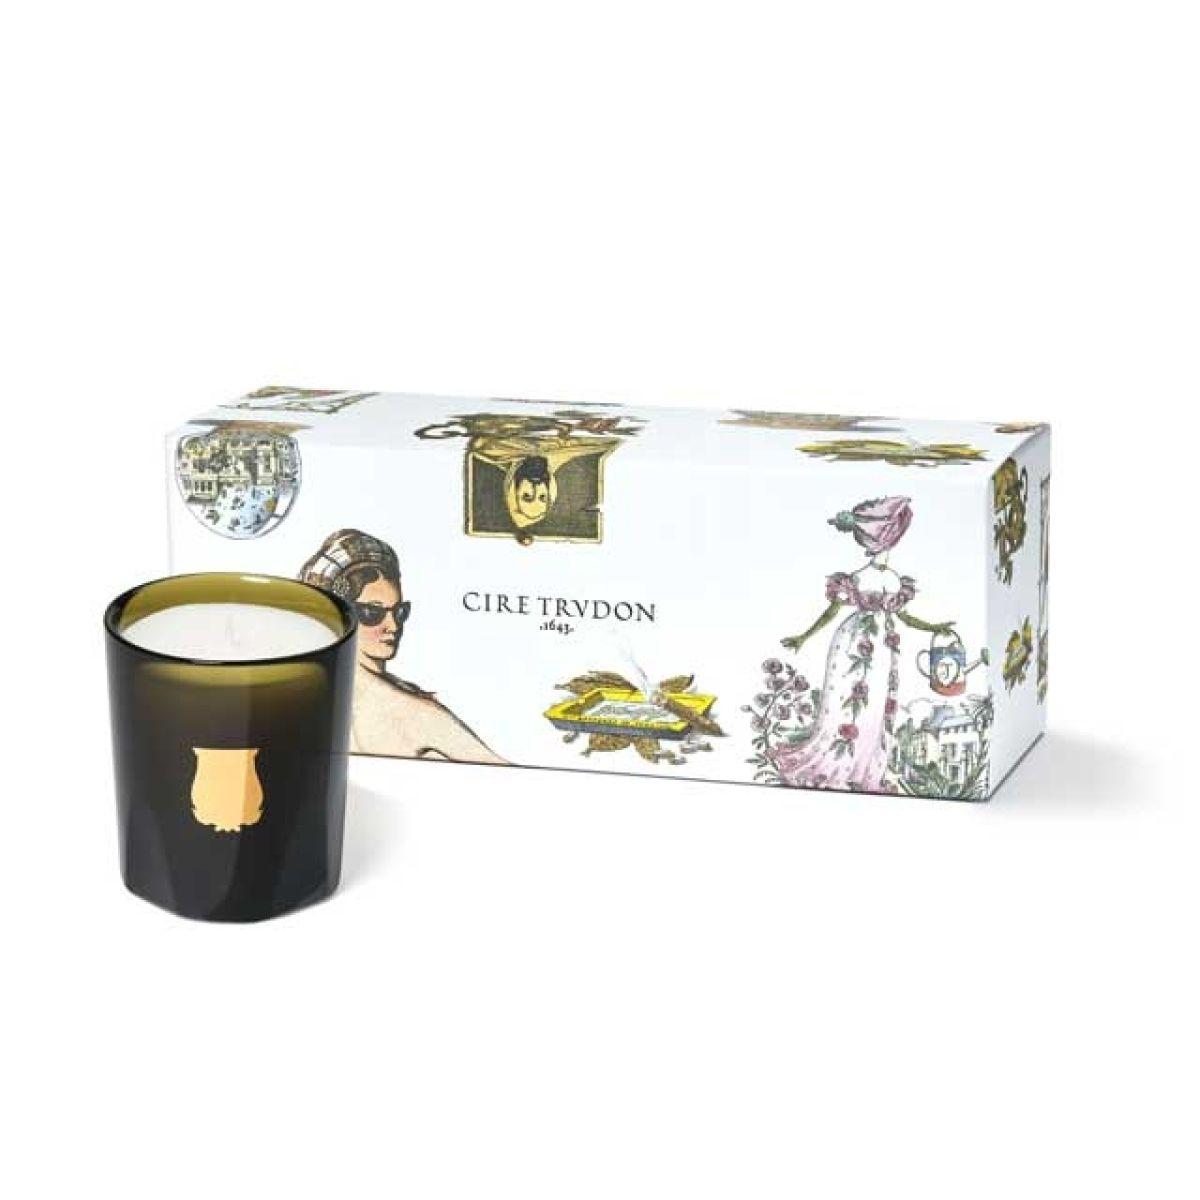 Gift box for 3 Petites Bougies